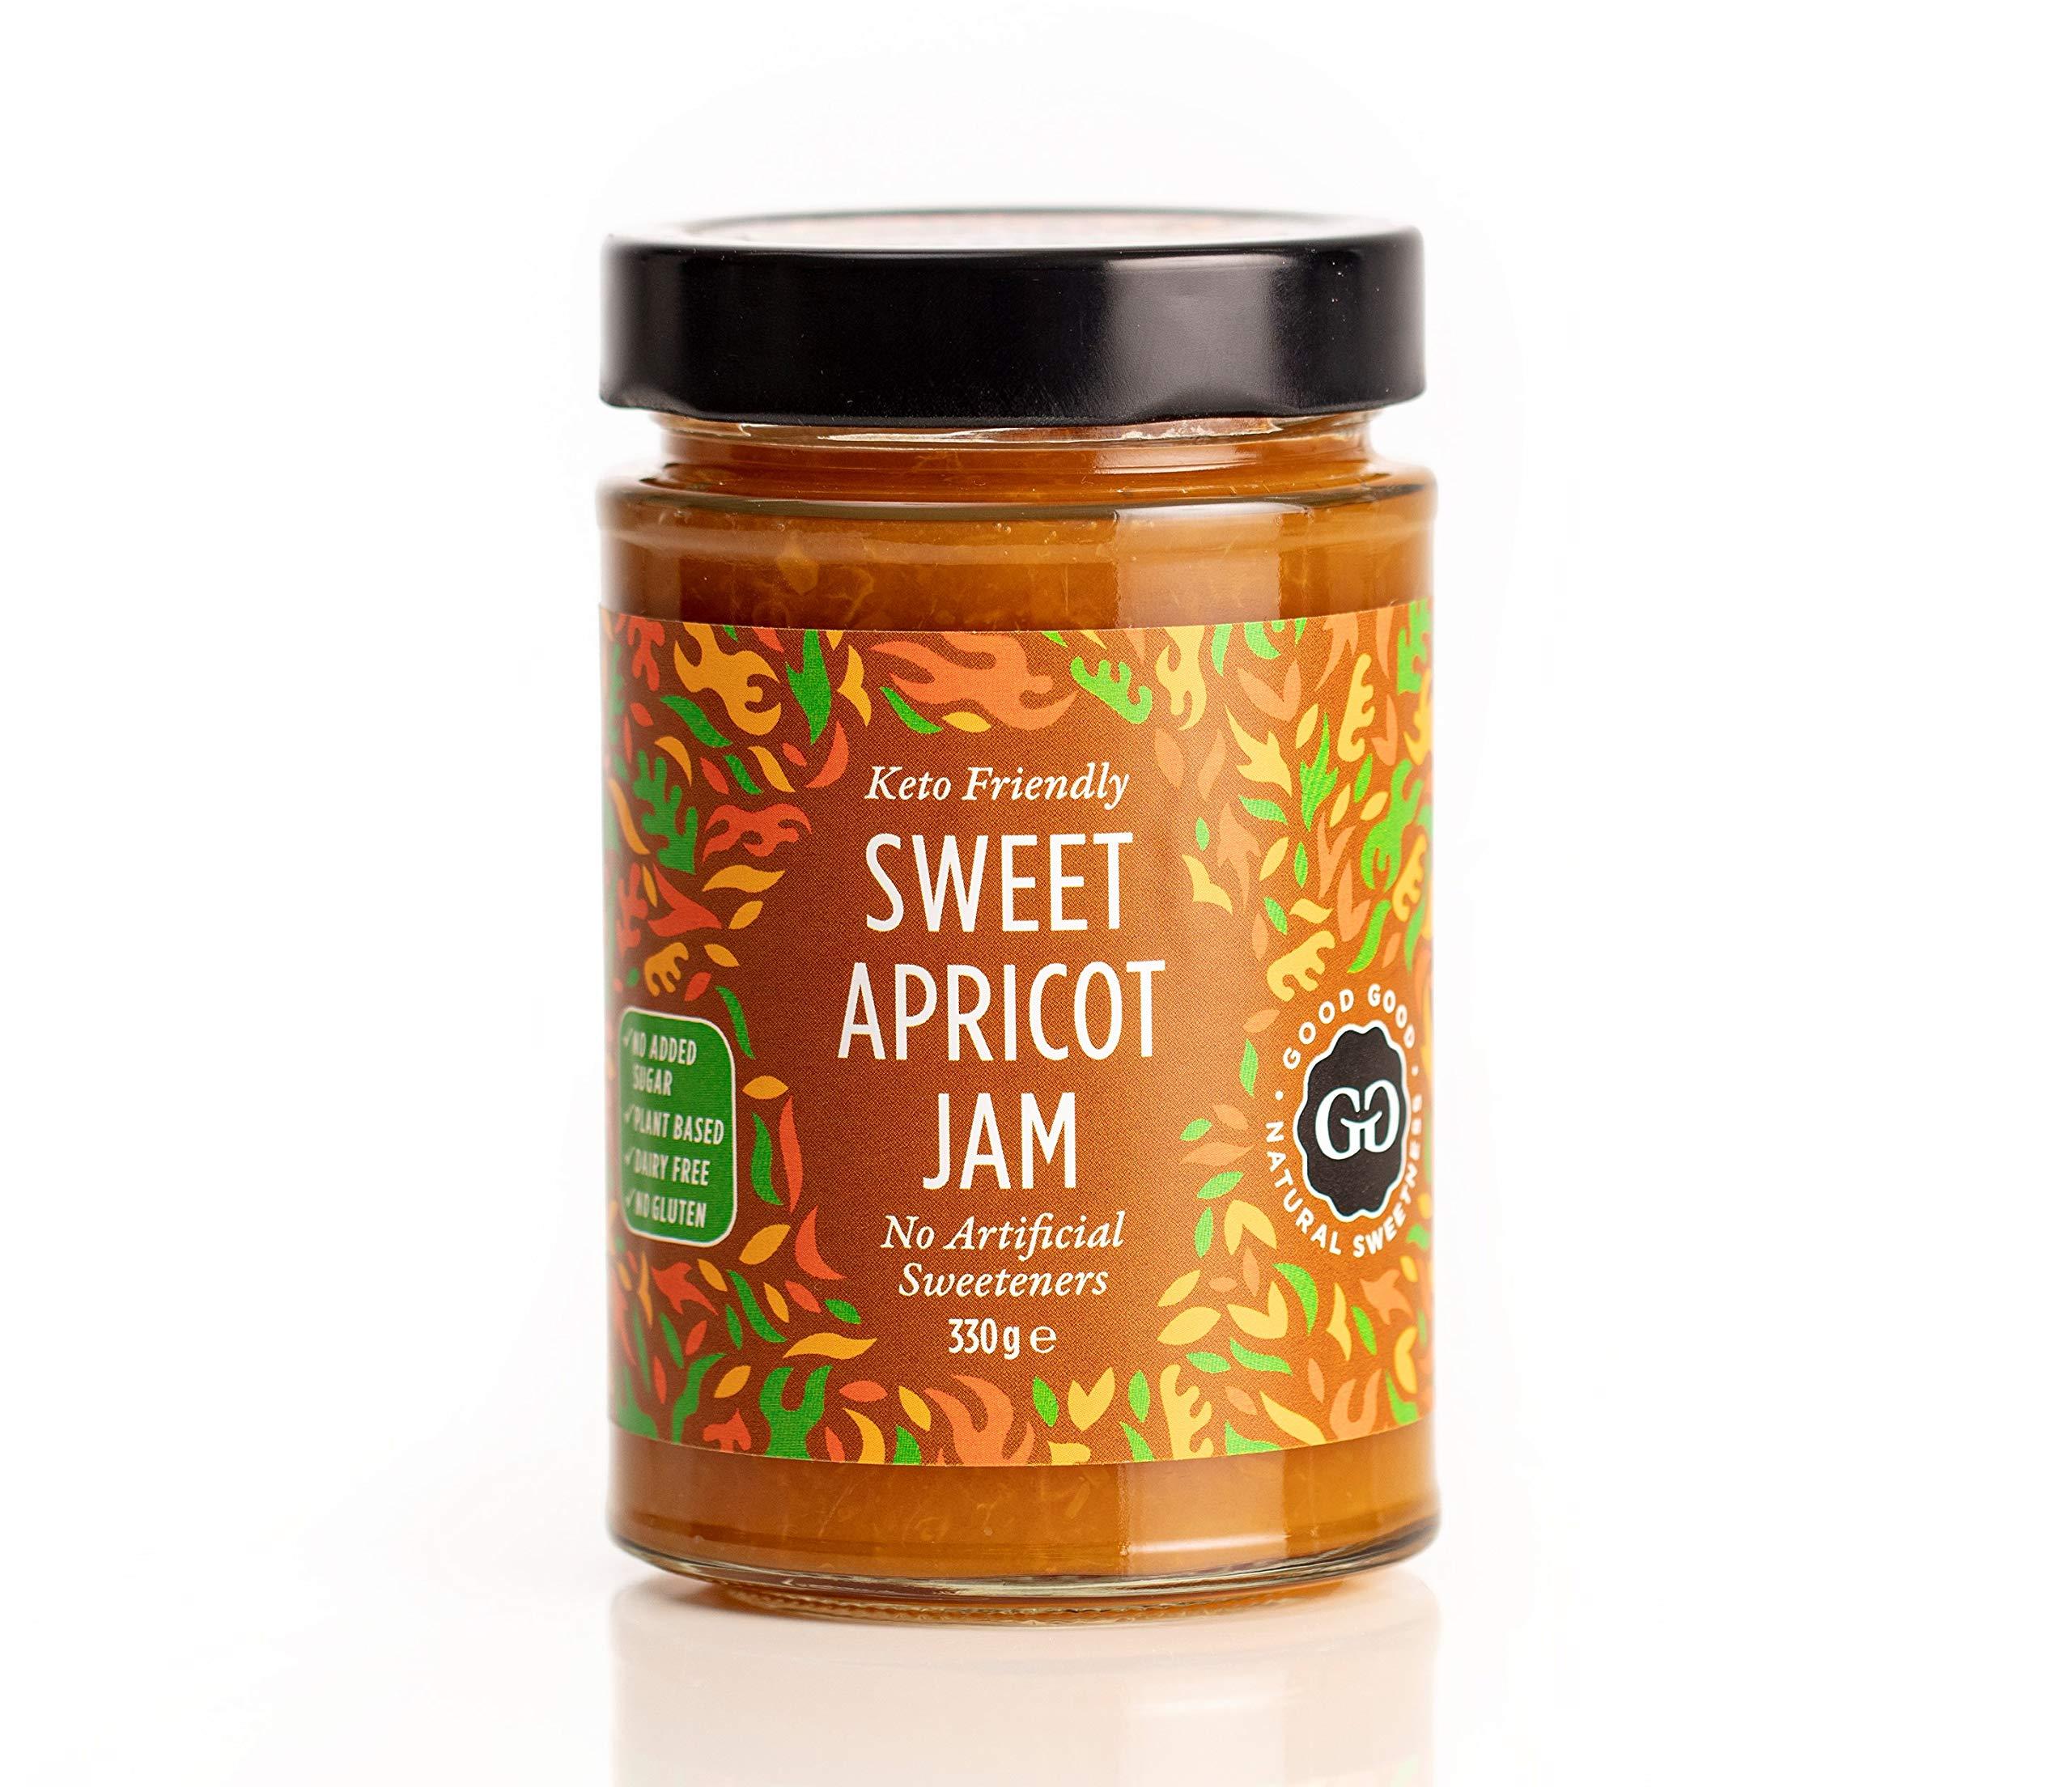 Sweet Apricot Jam by Good Good - 12 oz / 330 g - No Added Sugar Apricot Jam - Vegan - Gluten Free - Diabetic (Apricot) but is: Good Good Jam with Stevia - Apricot 330g